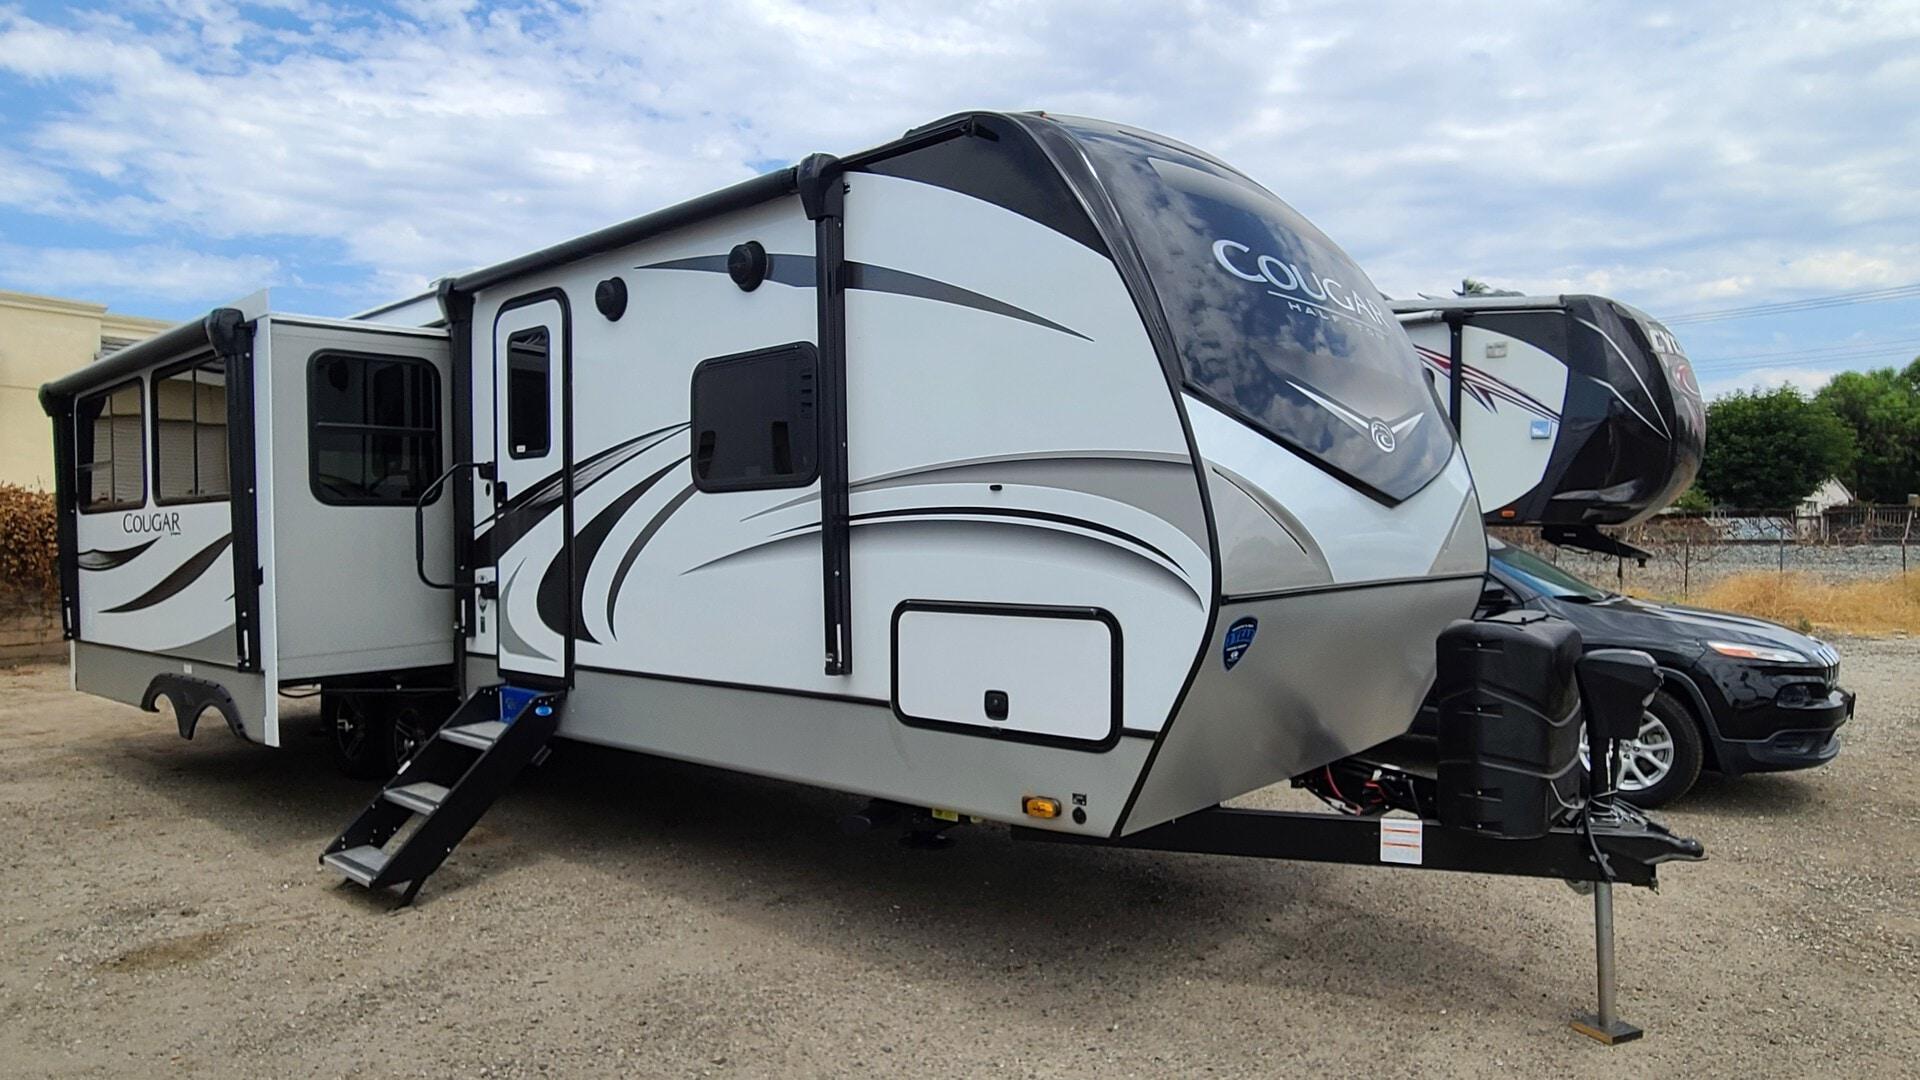 New, 2021, Cougar RV, 29RLS, Travel Trailers